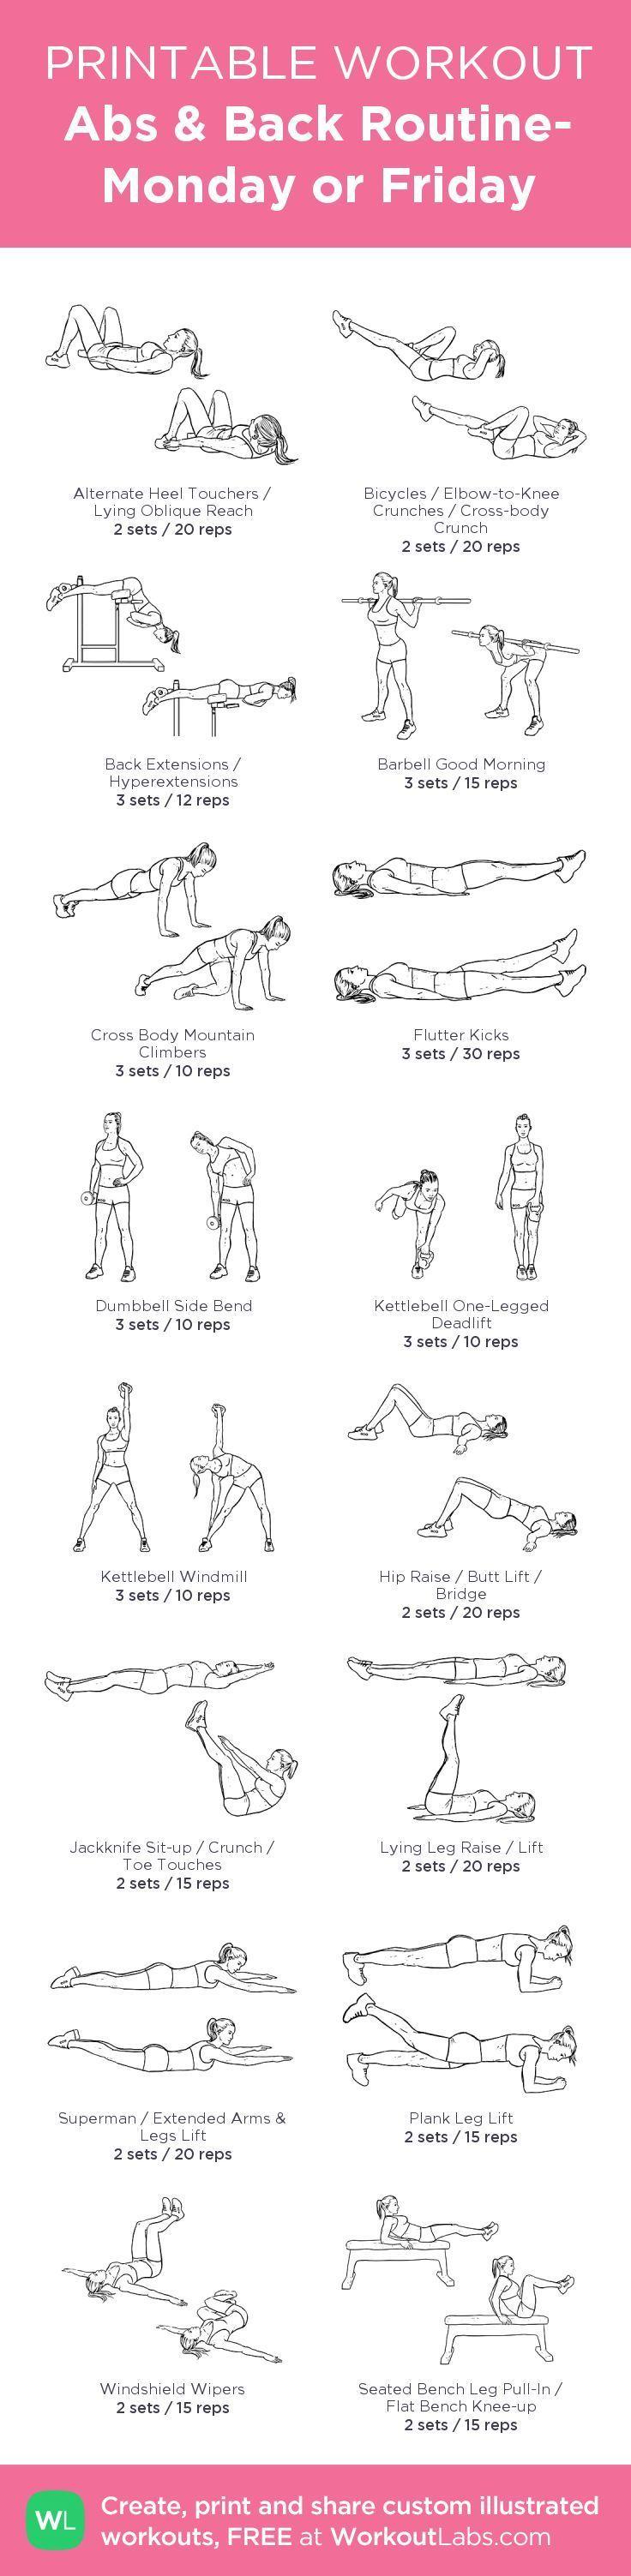 Best Back routine ideas on Pinterest